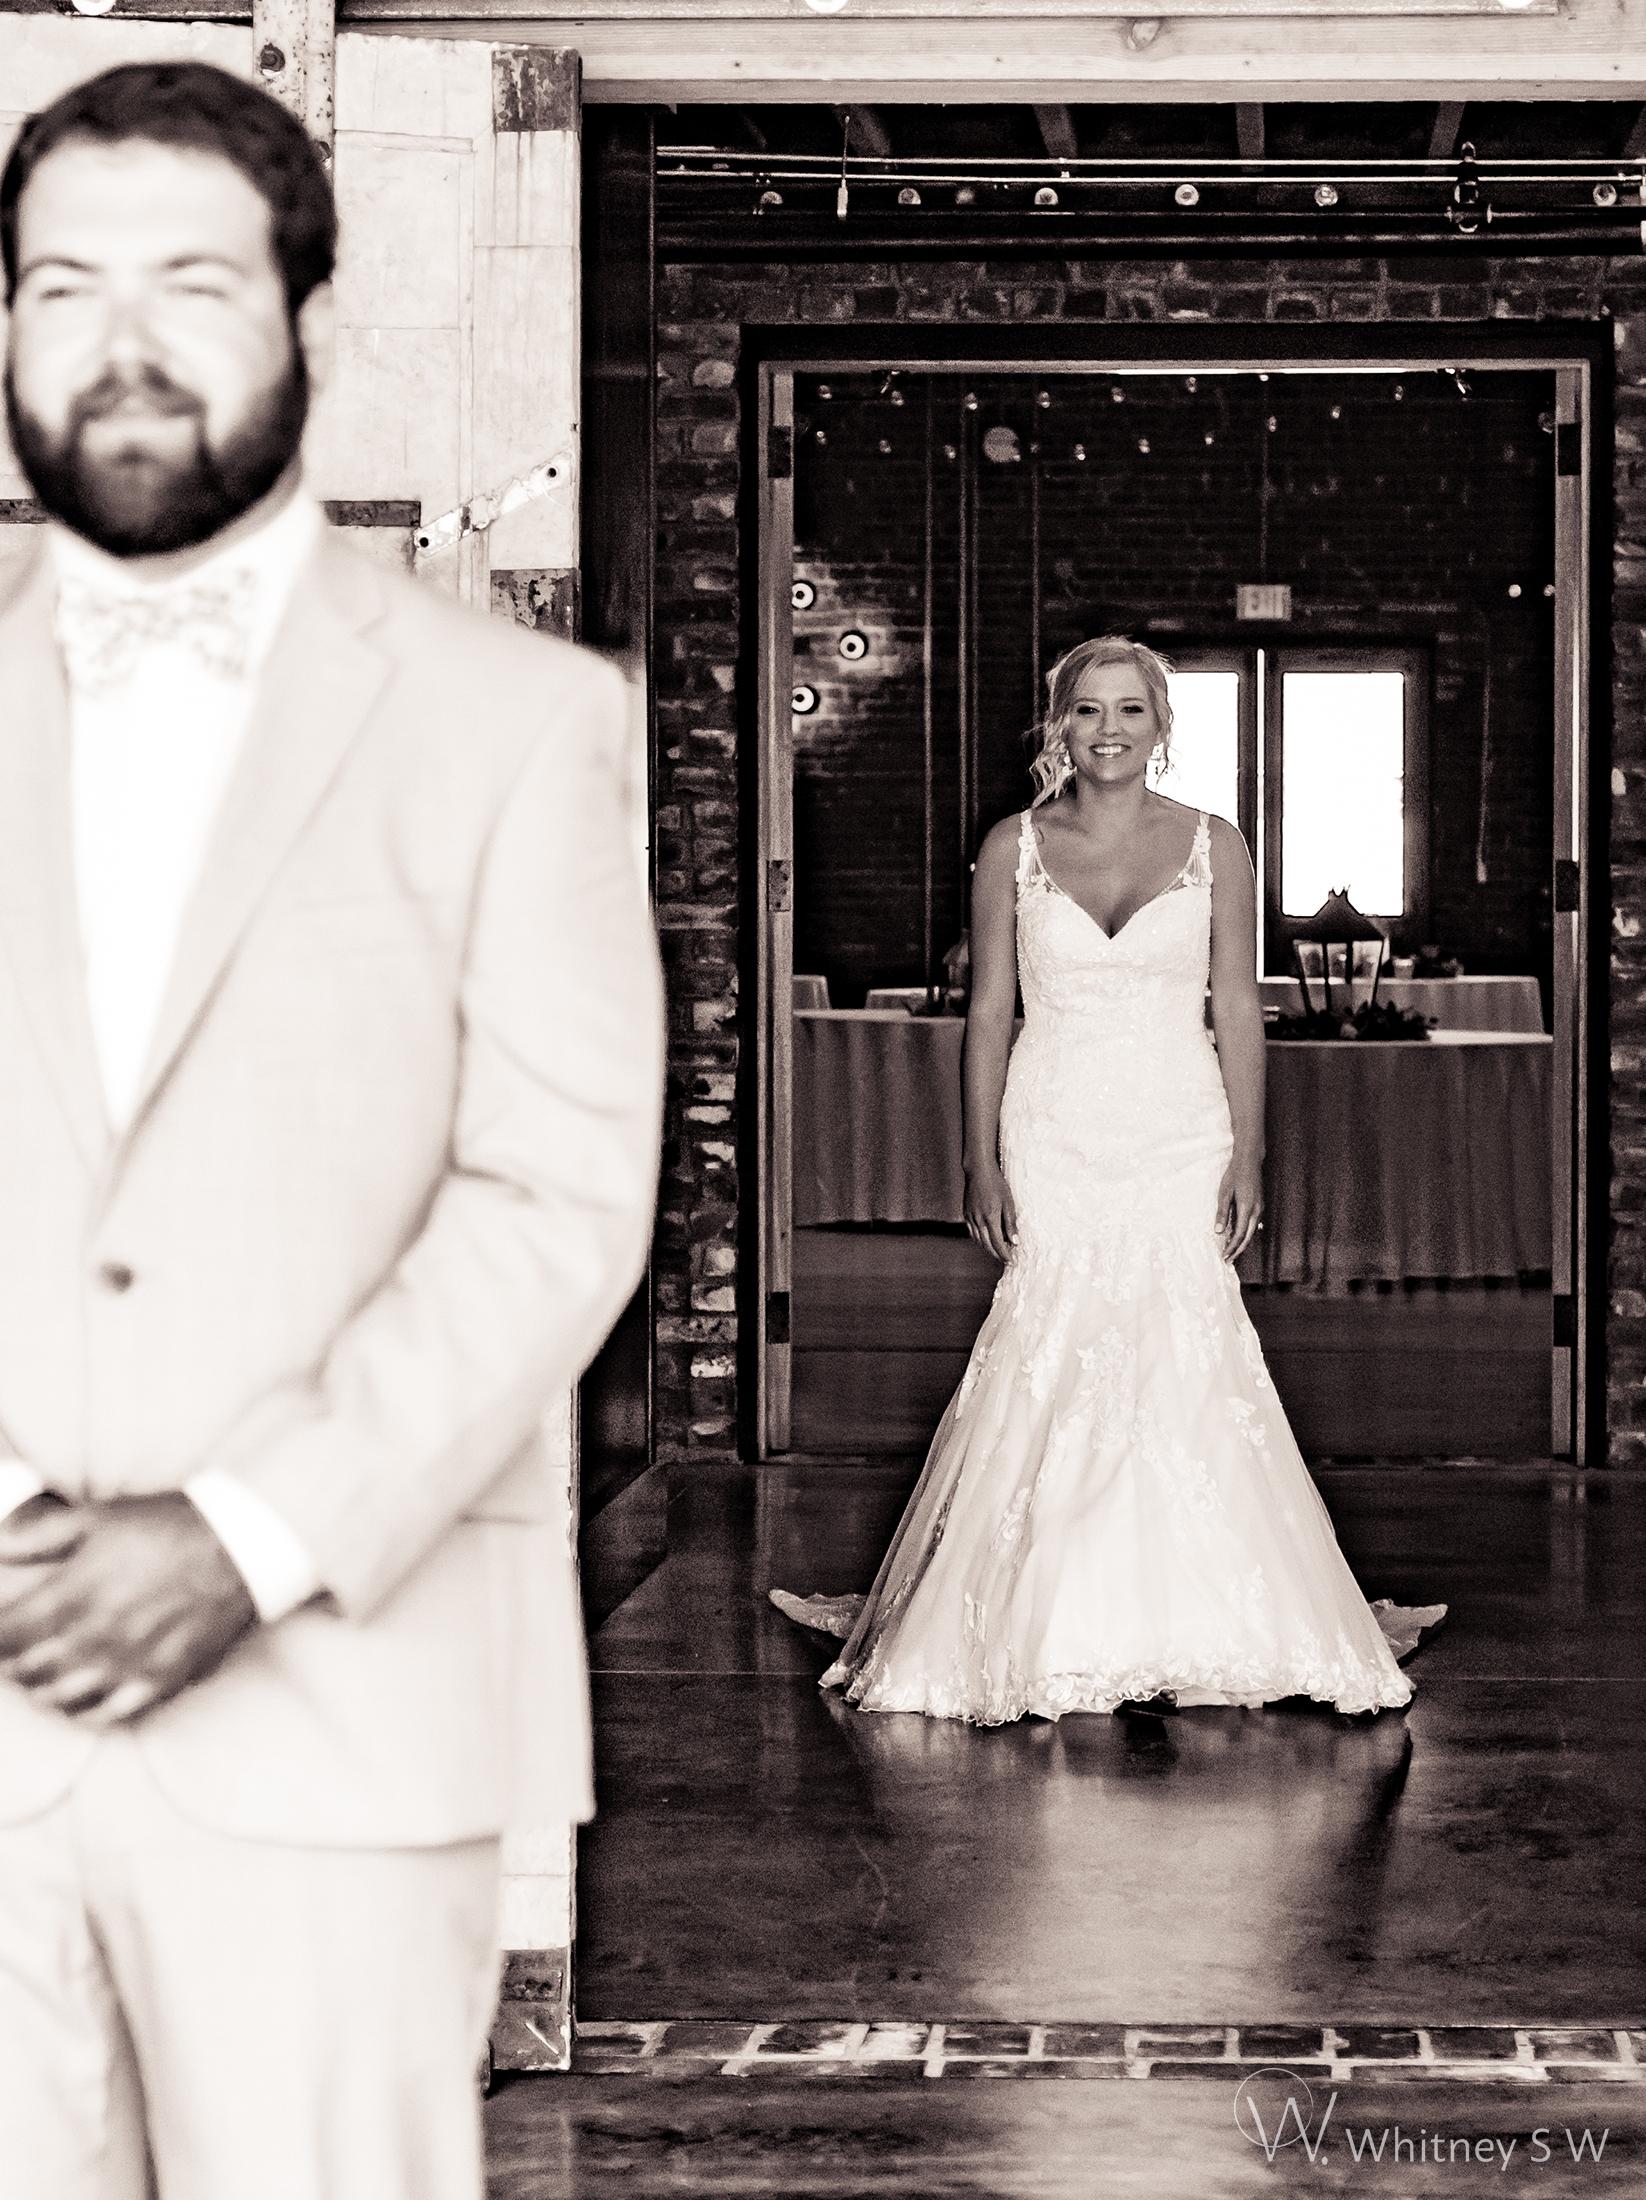 Morgan & Kaivon Wedding - Photography by Whitney S Williams whitneysw (30).jpg